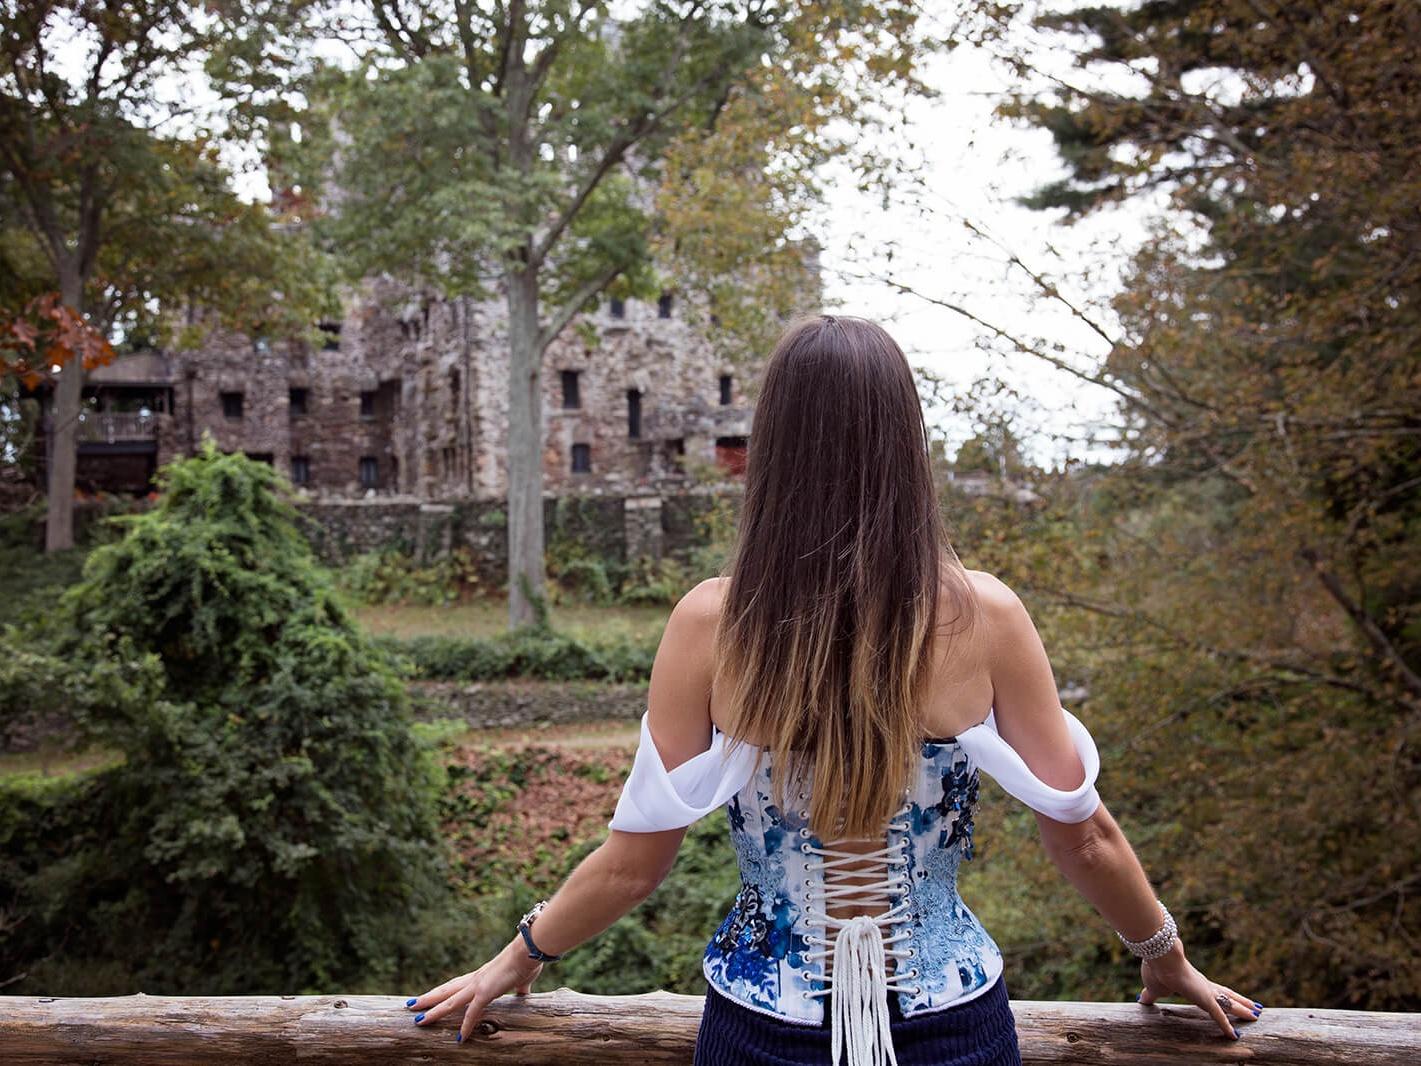 Woman in Off-Shoulder Corset near stone castle